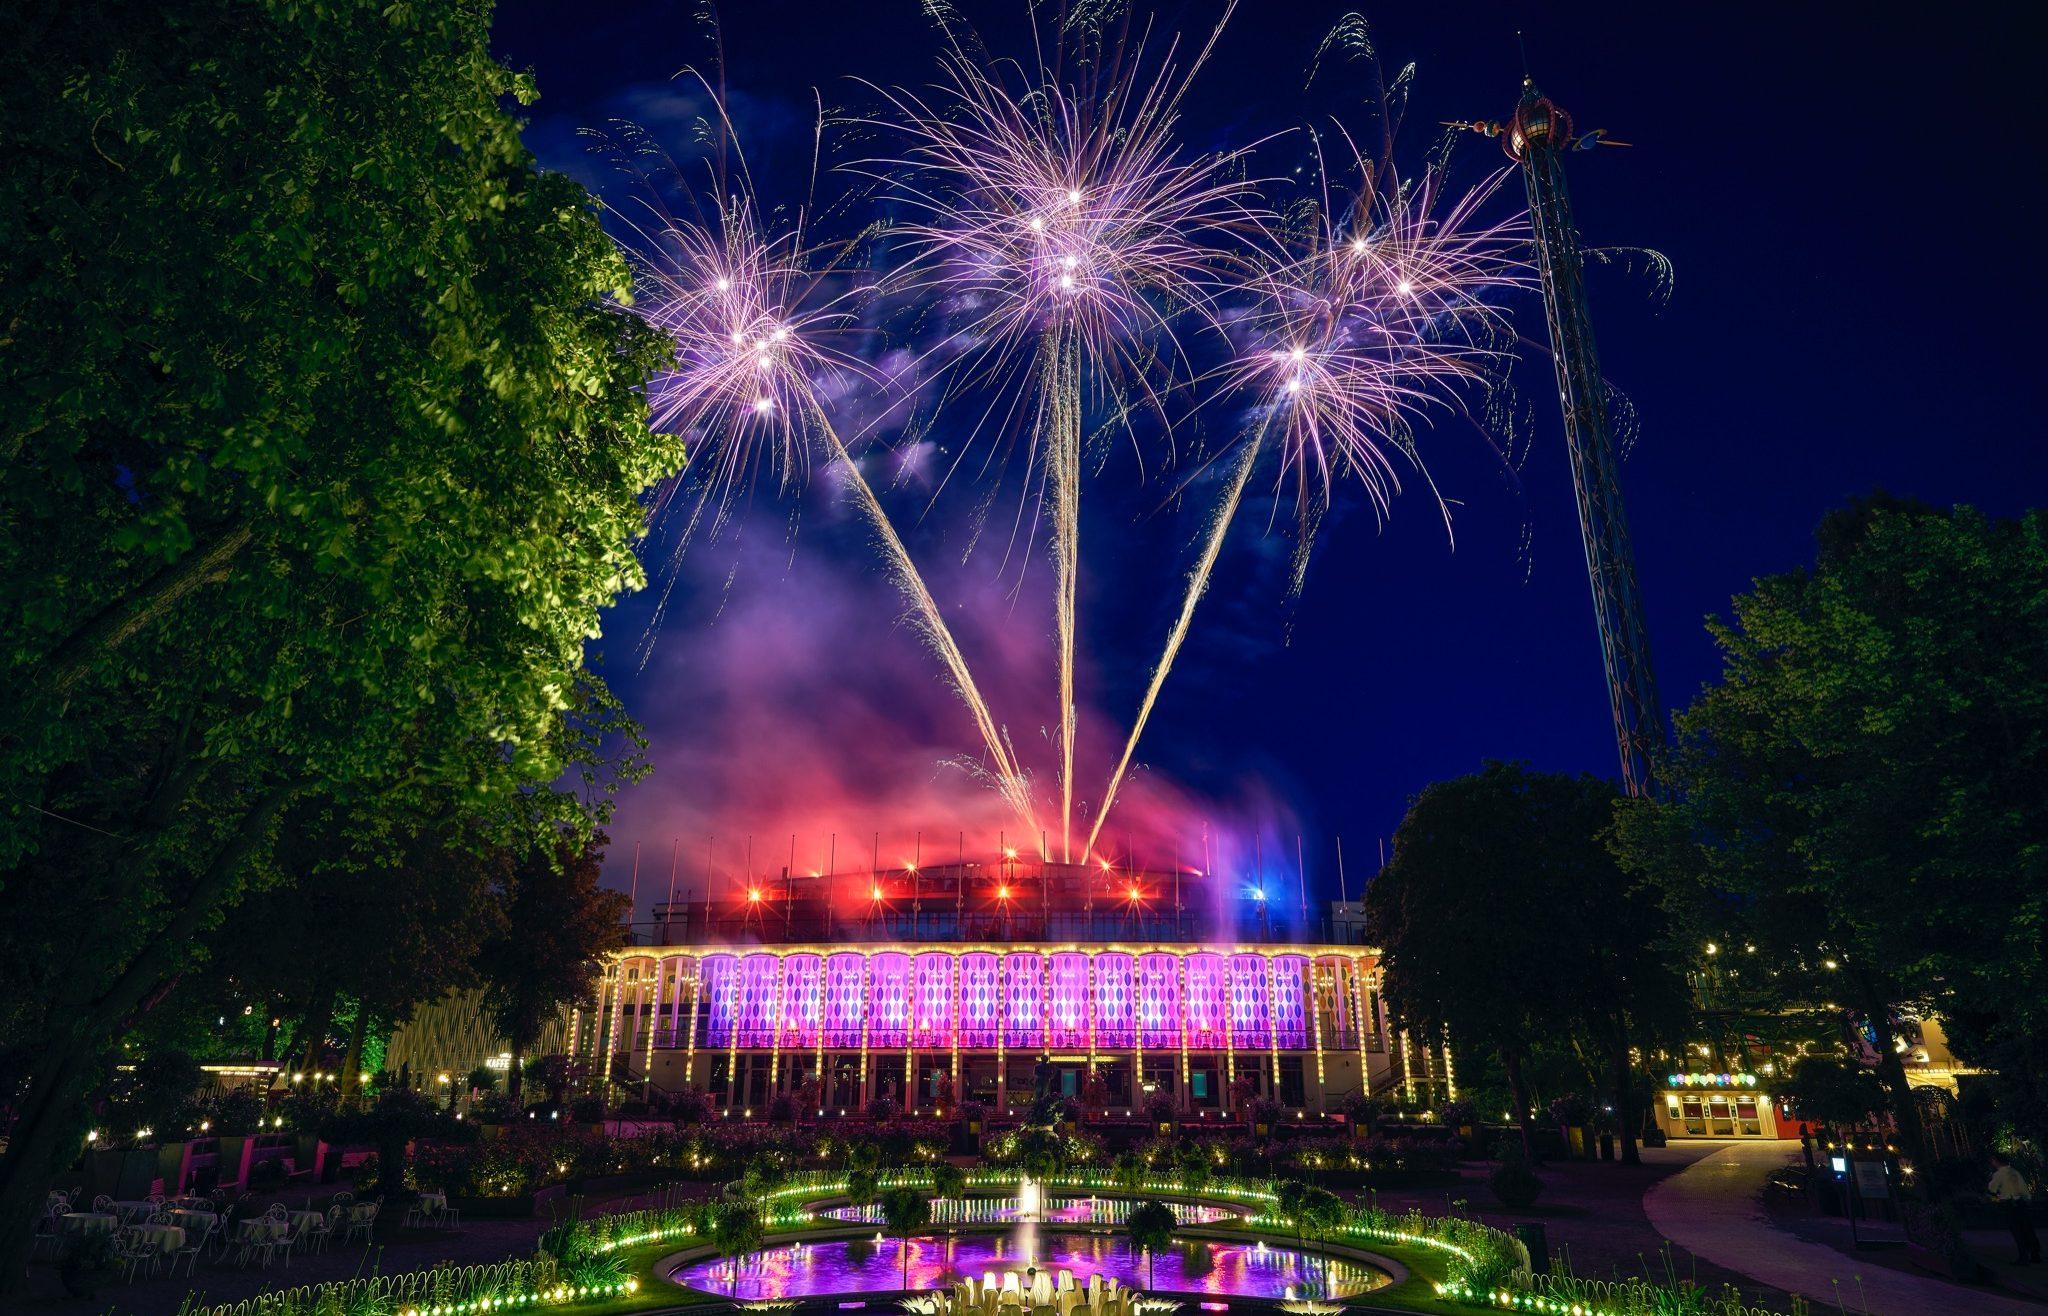 Sommer i Tivoli 2017. Lørdagsfyrværkeri